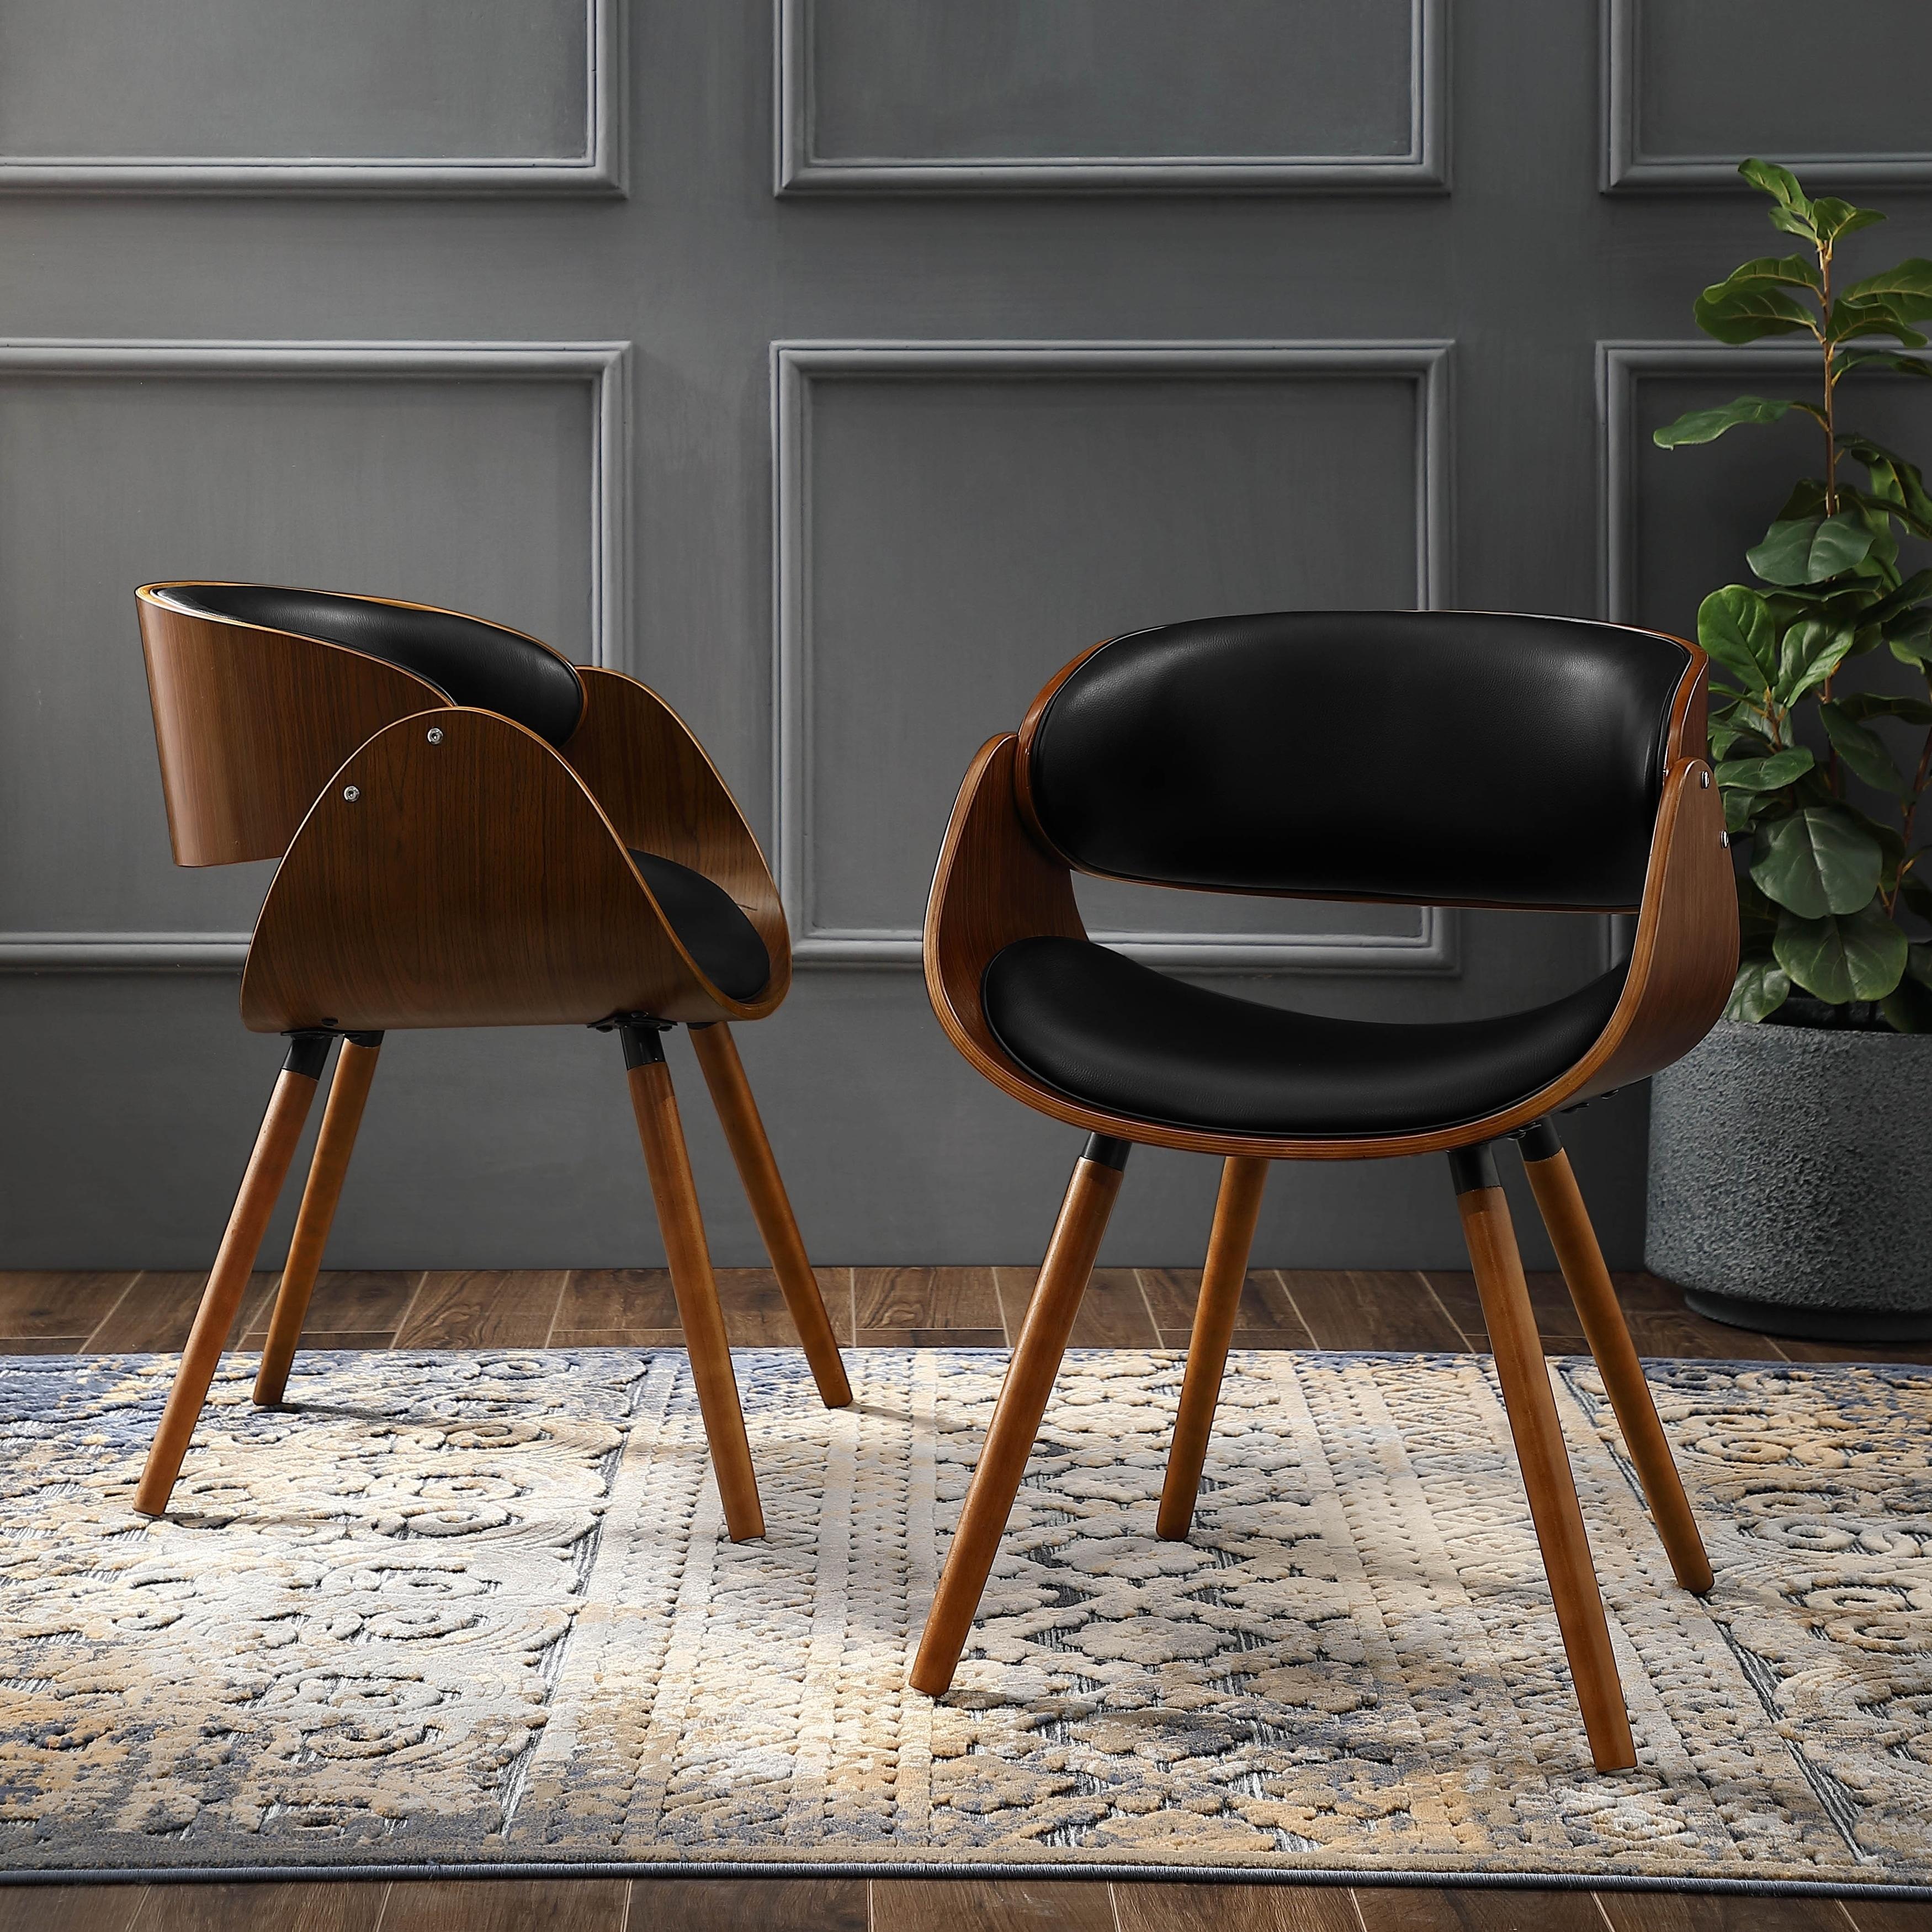 Sensational Corvus Mid Century Modern Accent Chair Ibusinesslaw Wood Chair Design Ideas Ibusinesslaworg